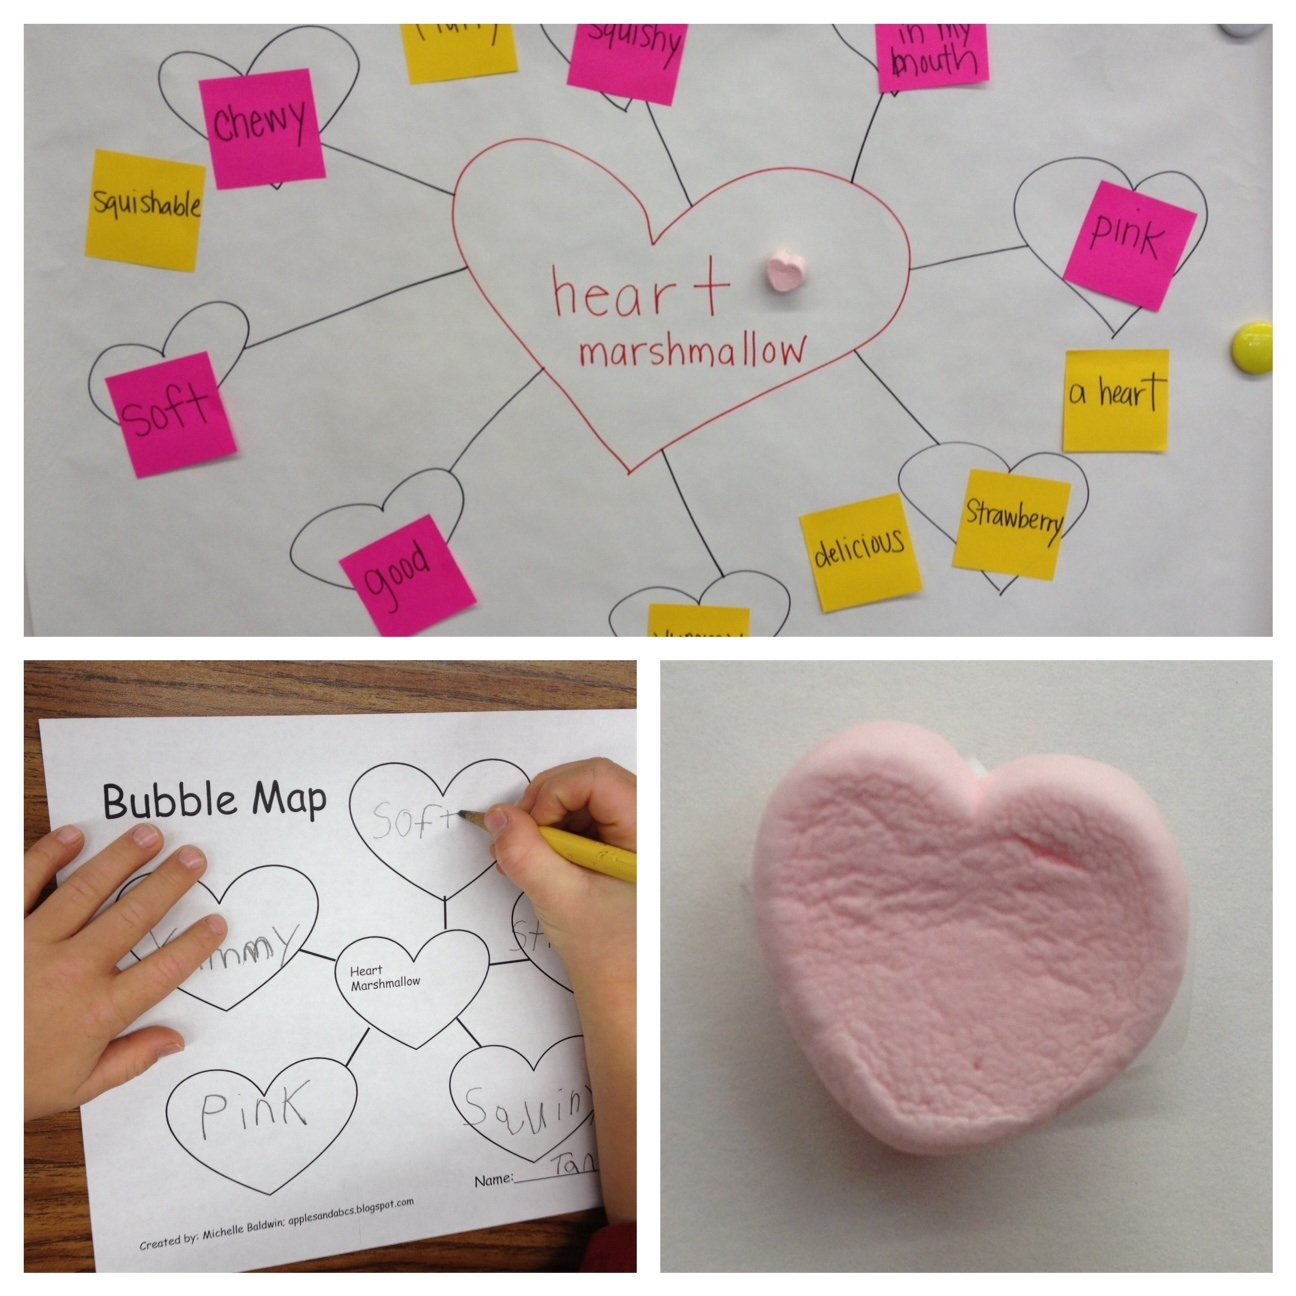 Marshmallow Heart Adjectives